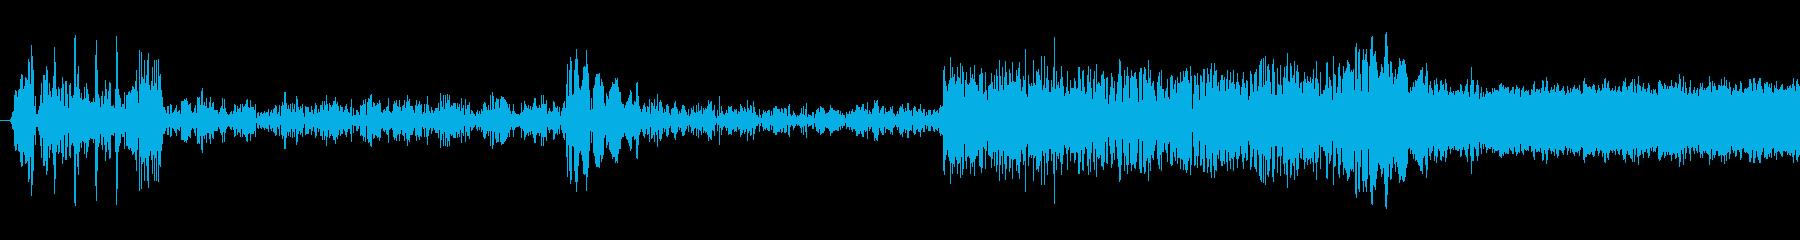 SciFi EC01_89_4の再生済みの波形